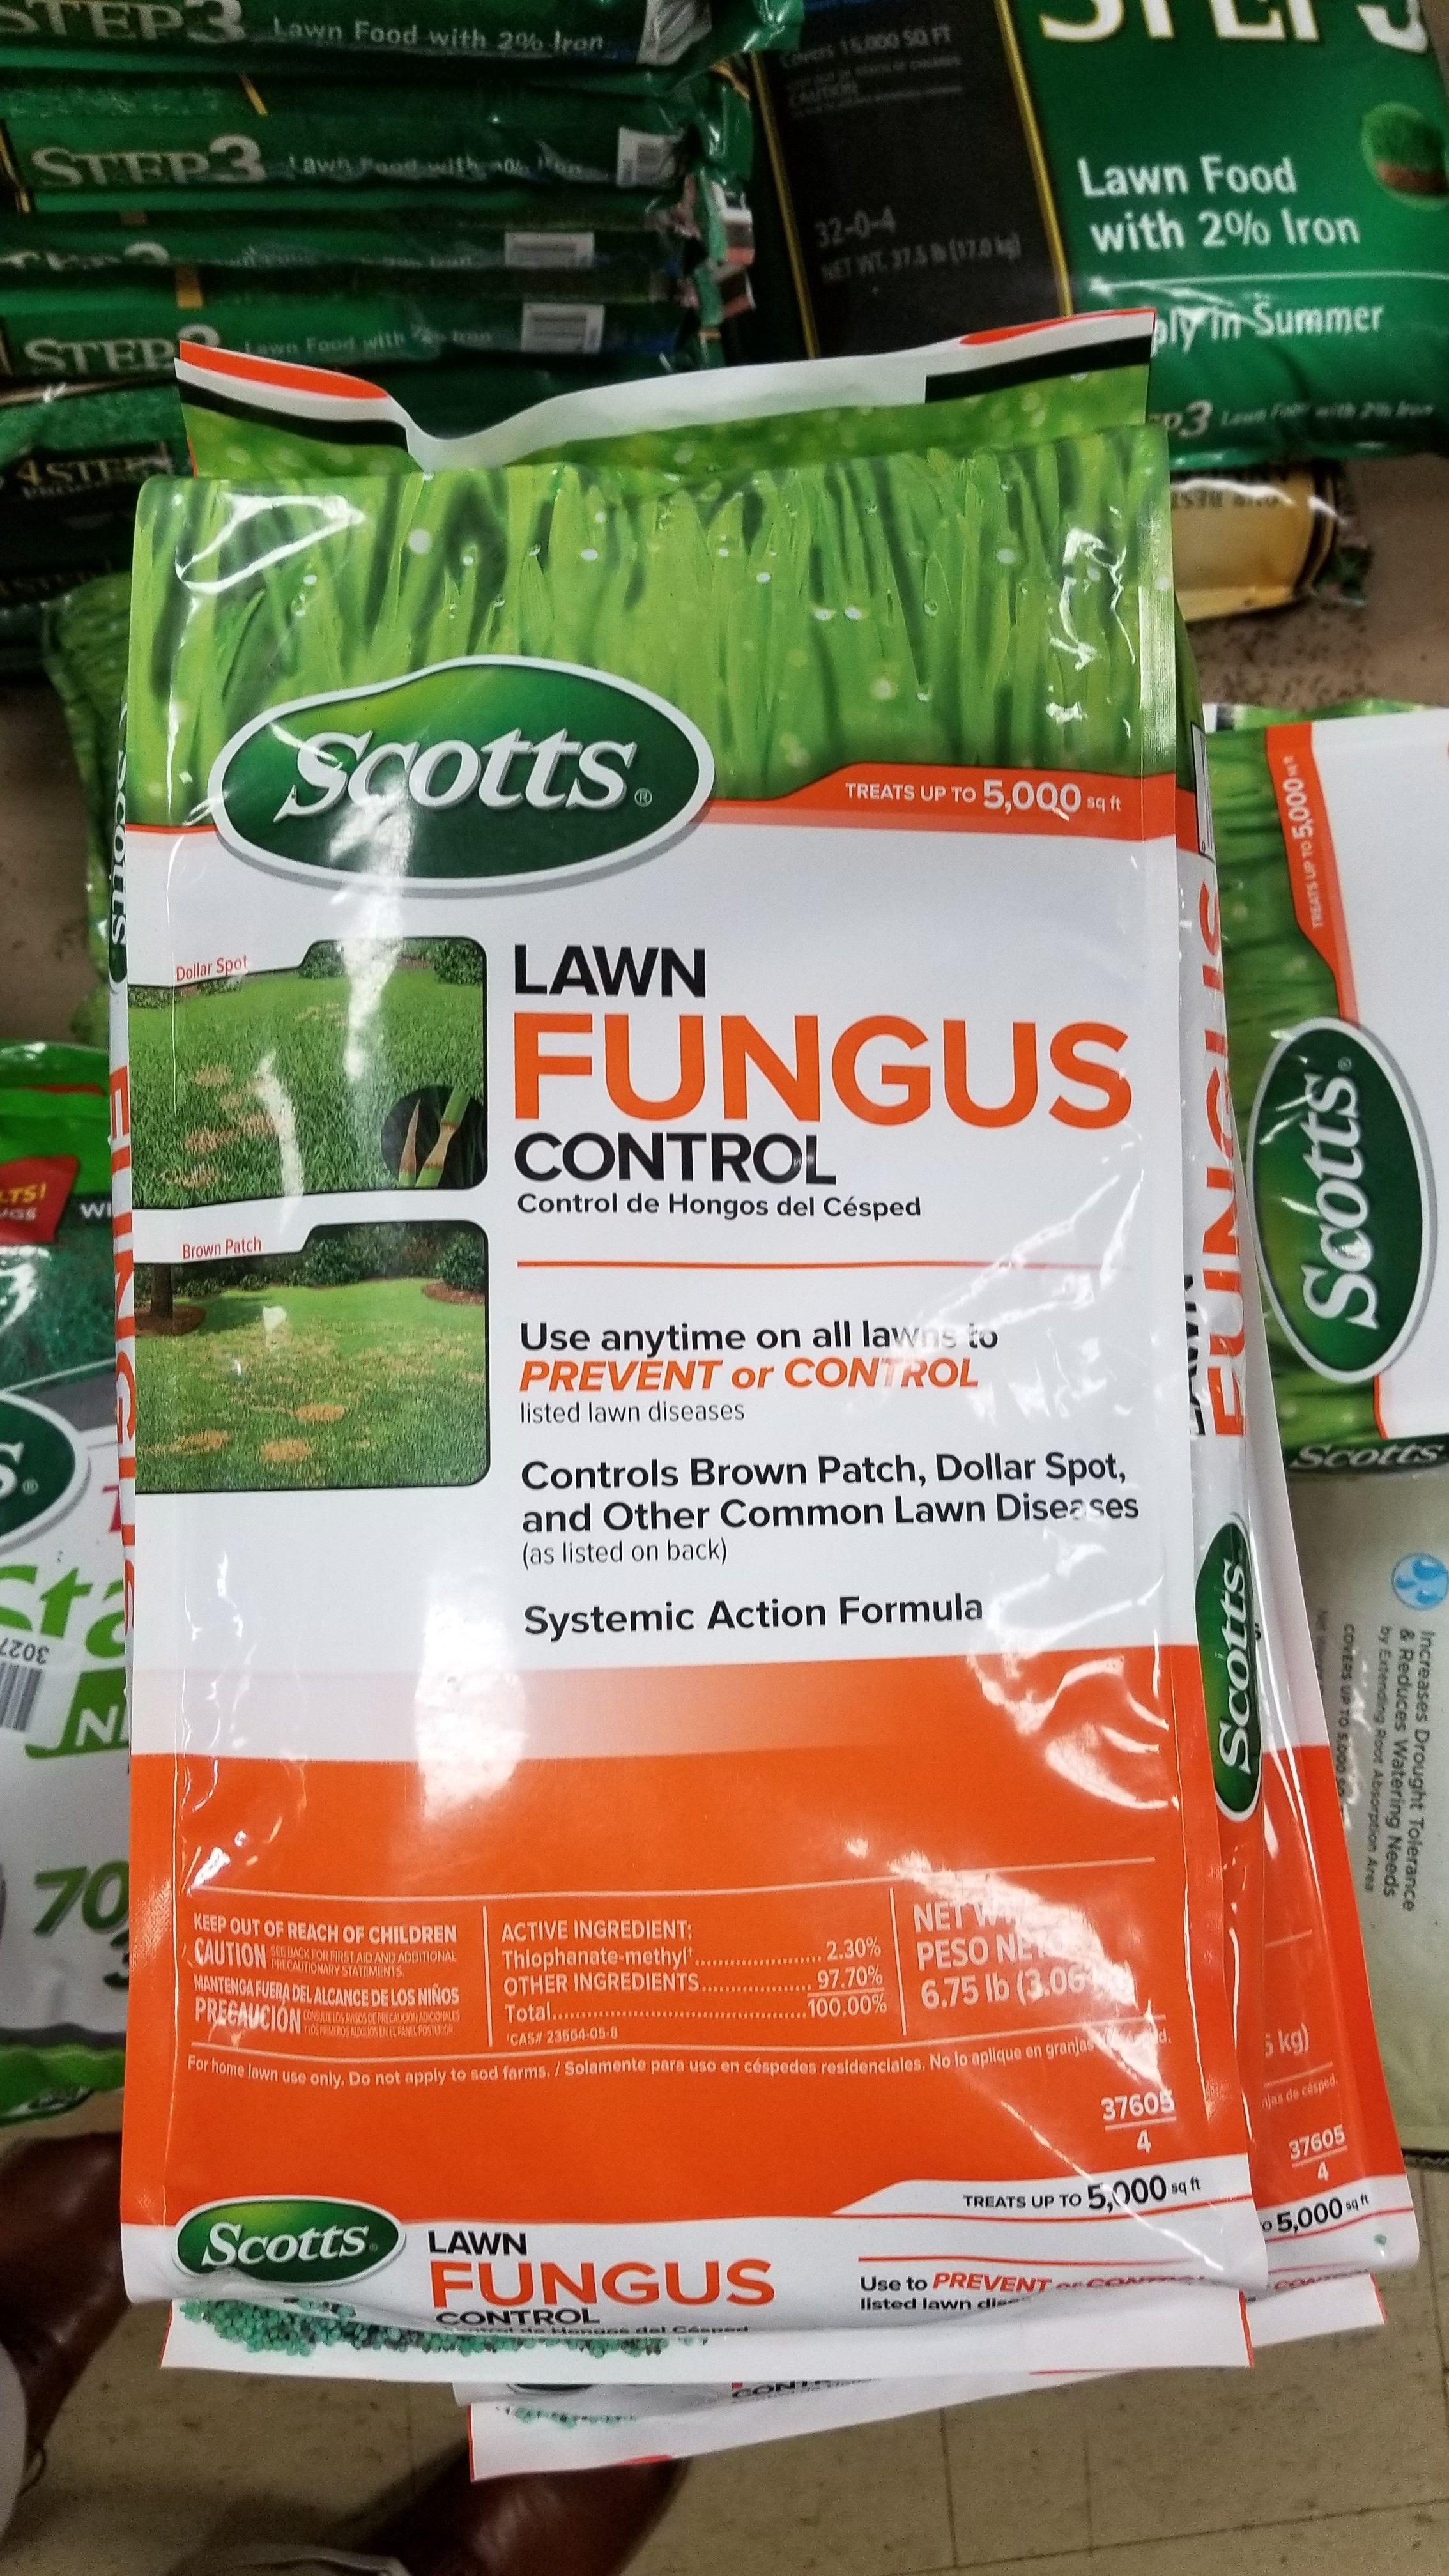 Scotts fungus control prevents major lawn diseases